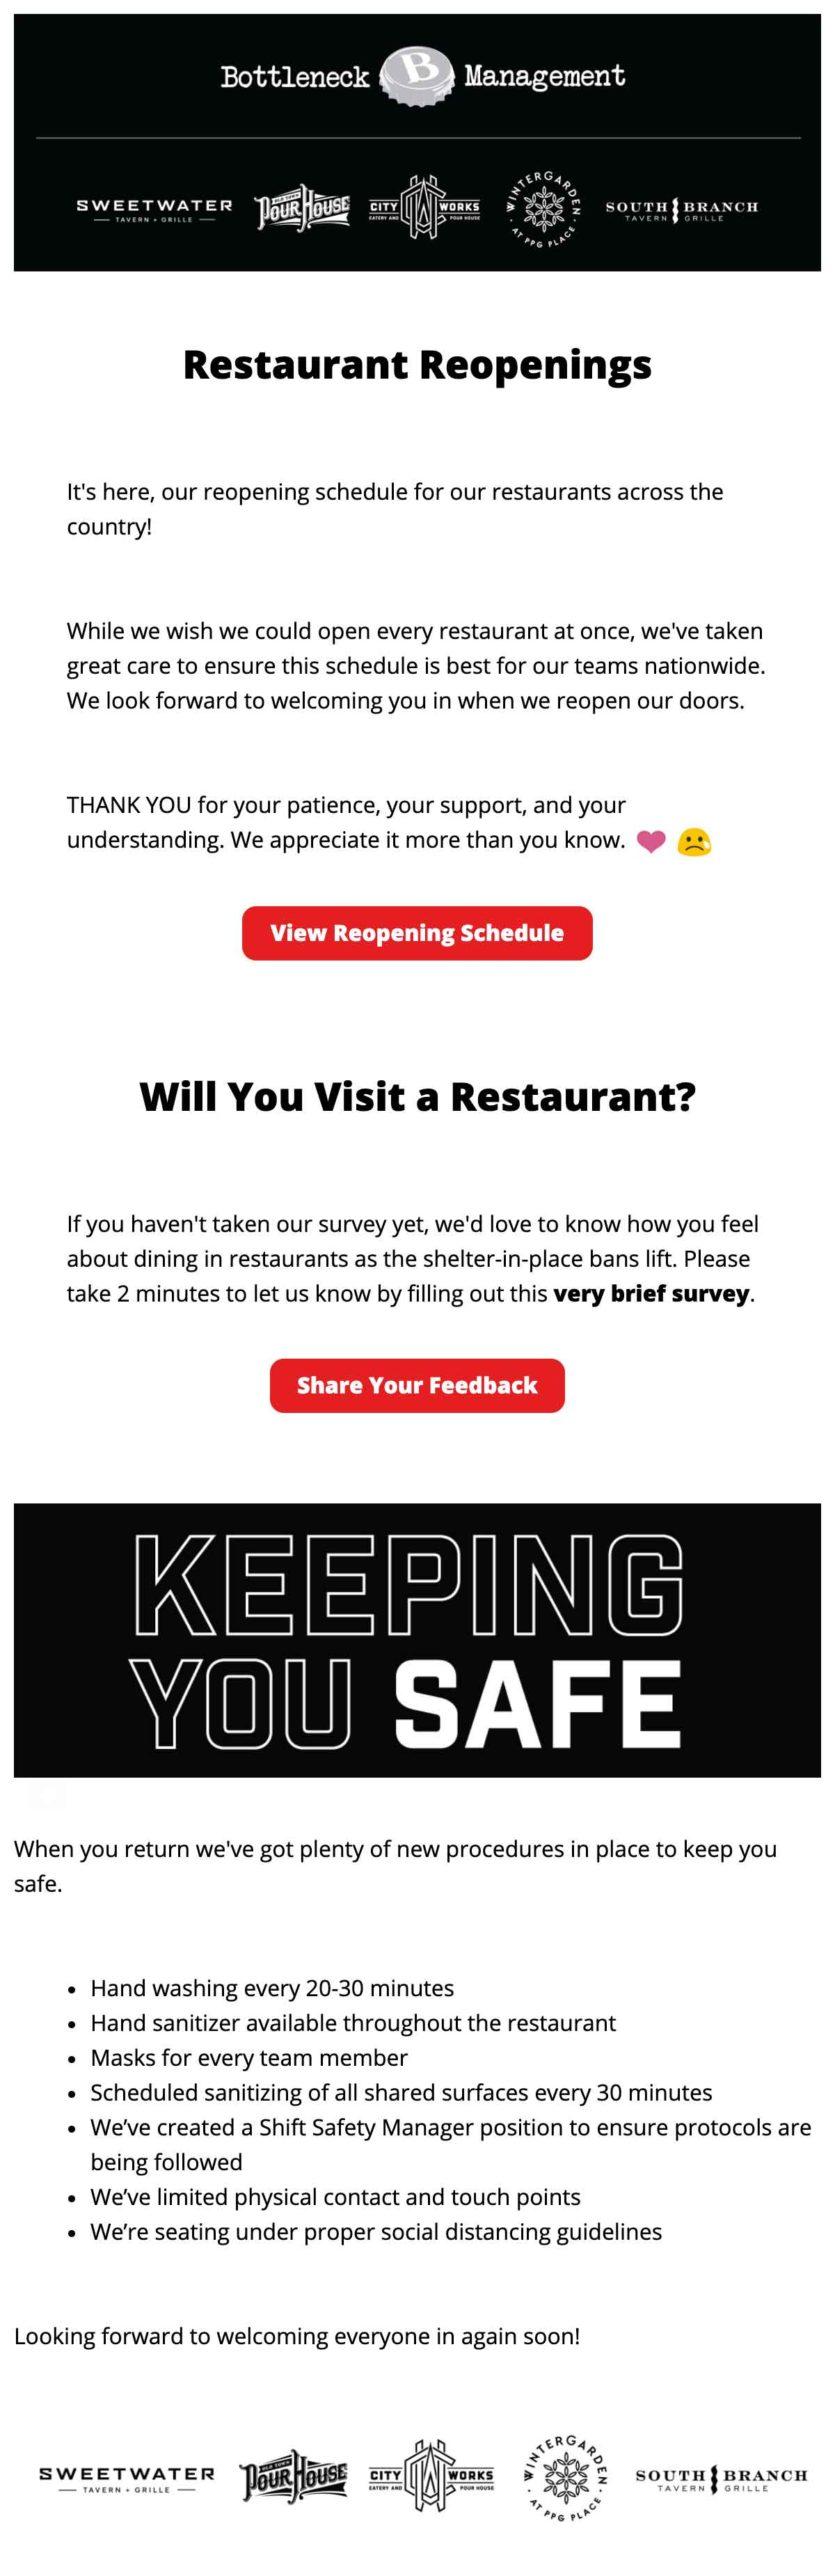 Bottleneck Management: Restaurant Reopenings Email